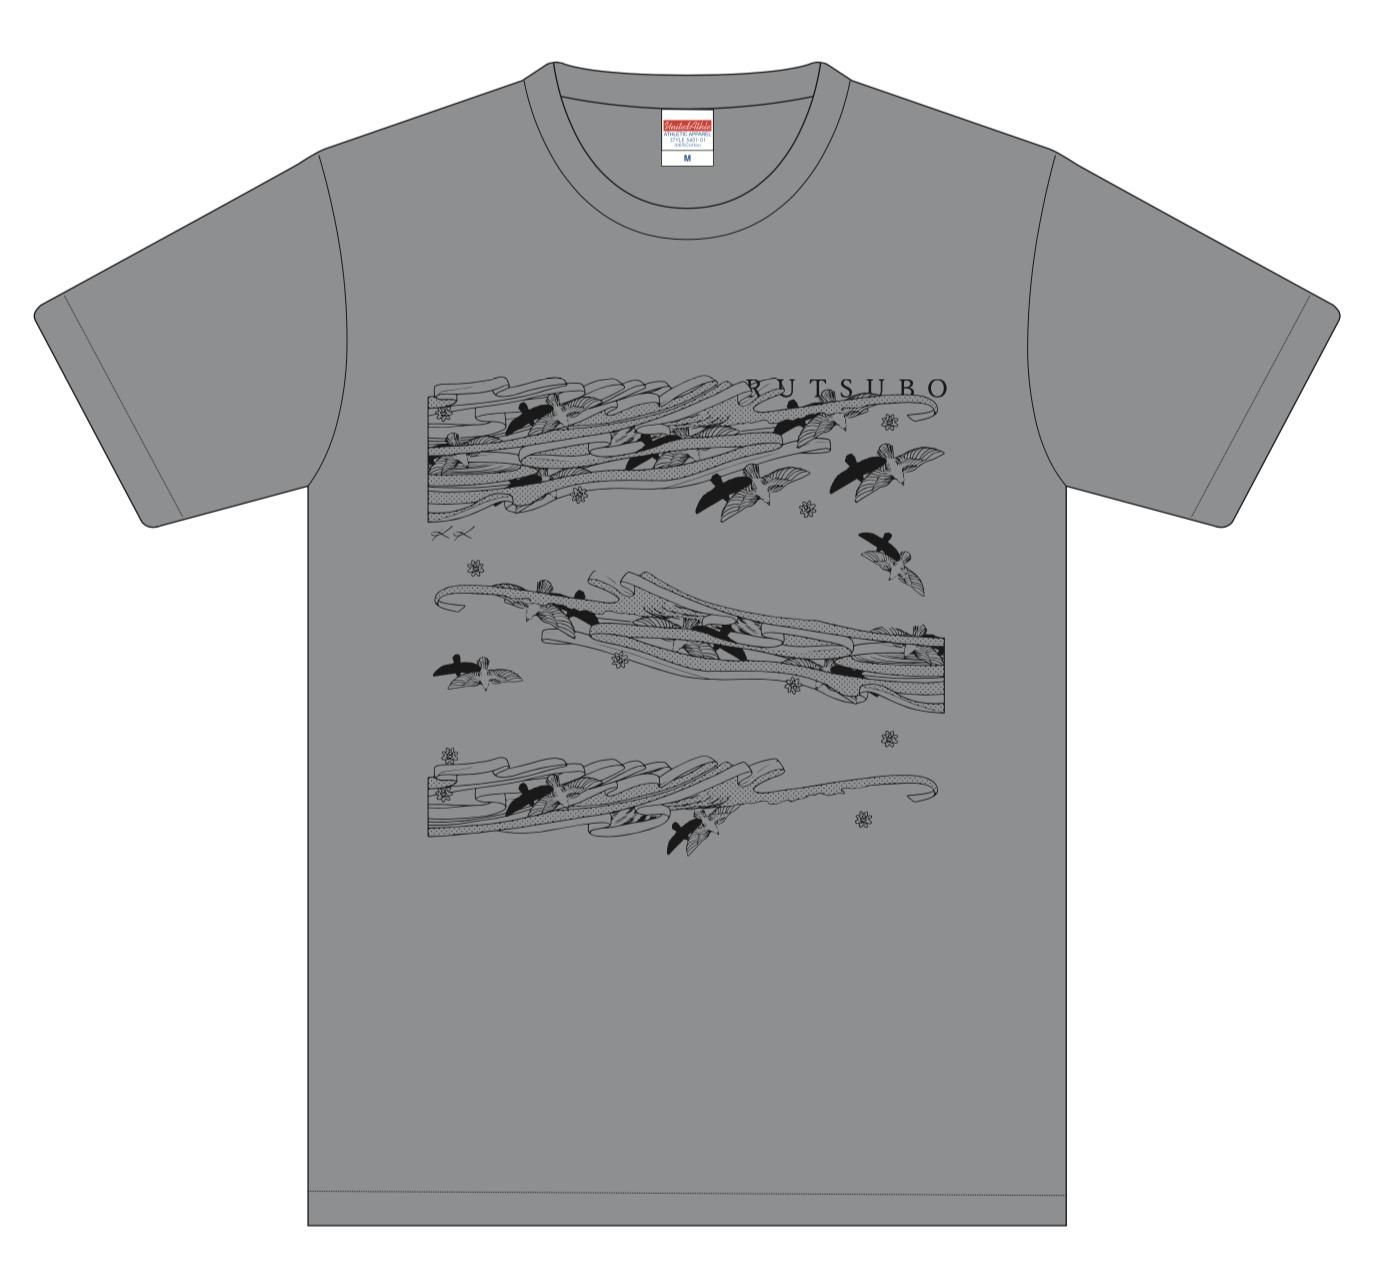 RUTSUBO T-shirt